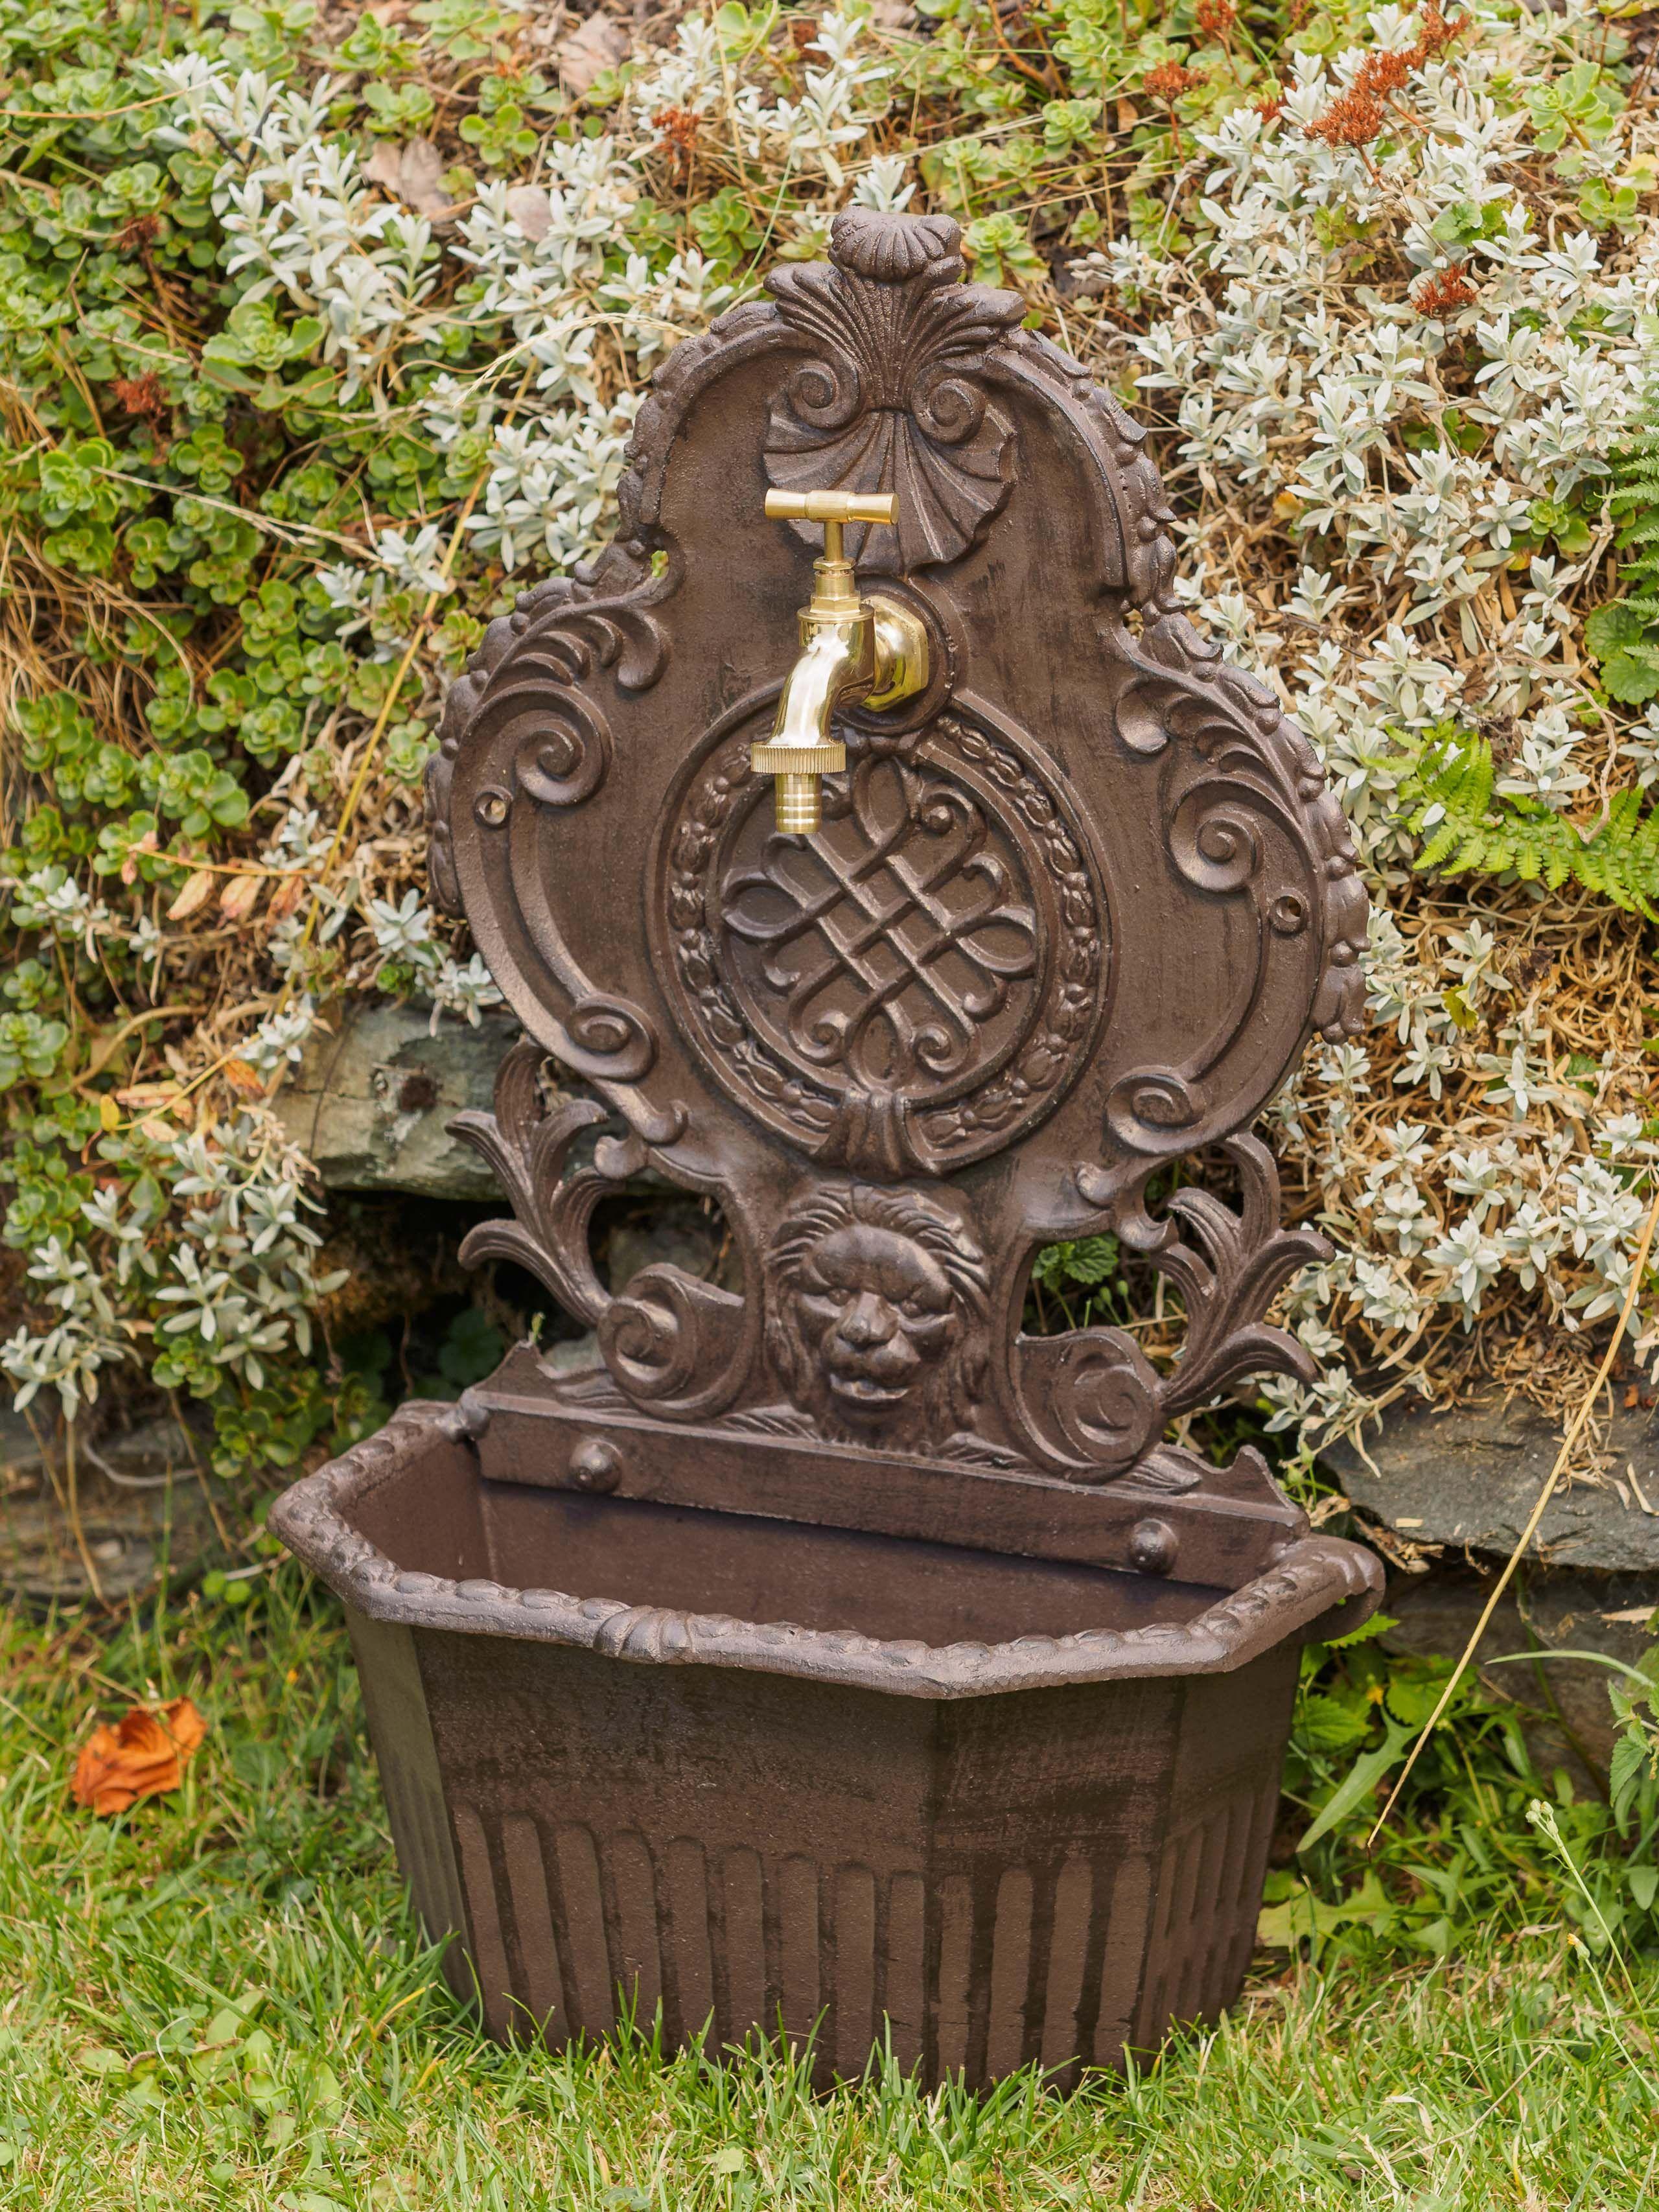 Waschbecken Brunnen Standbrunnen 59cm Alu Lowe Garten Nostalgie Stil Fountain Wandbrunnen Brunnen Waschbecken